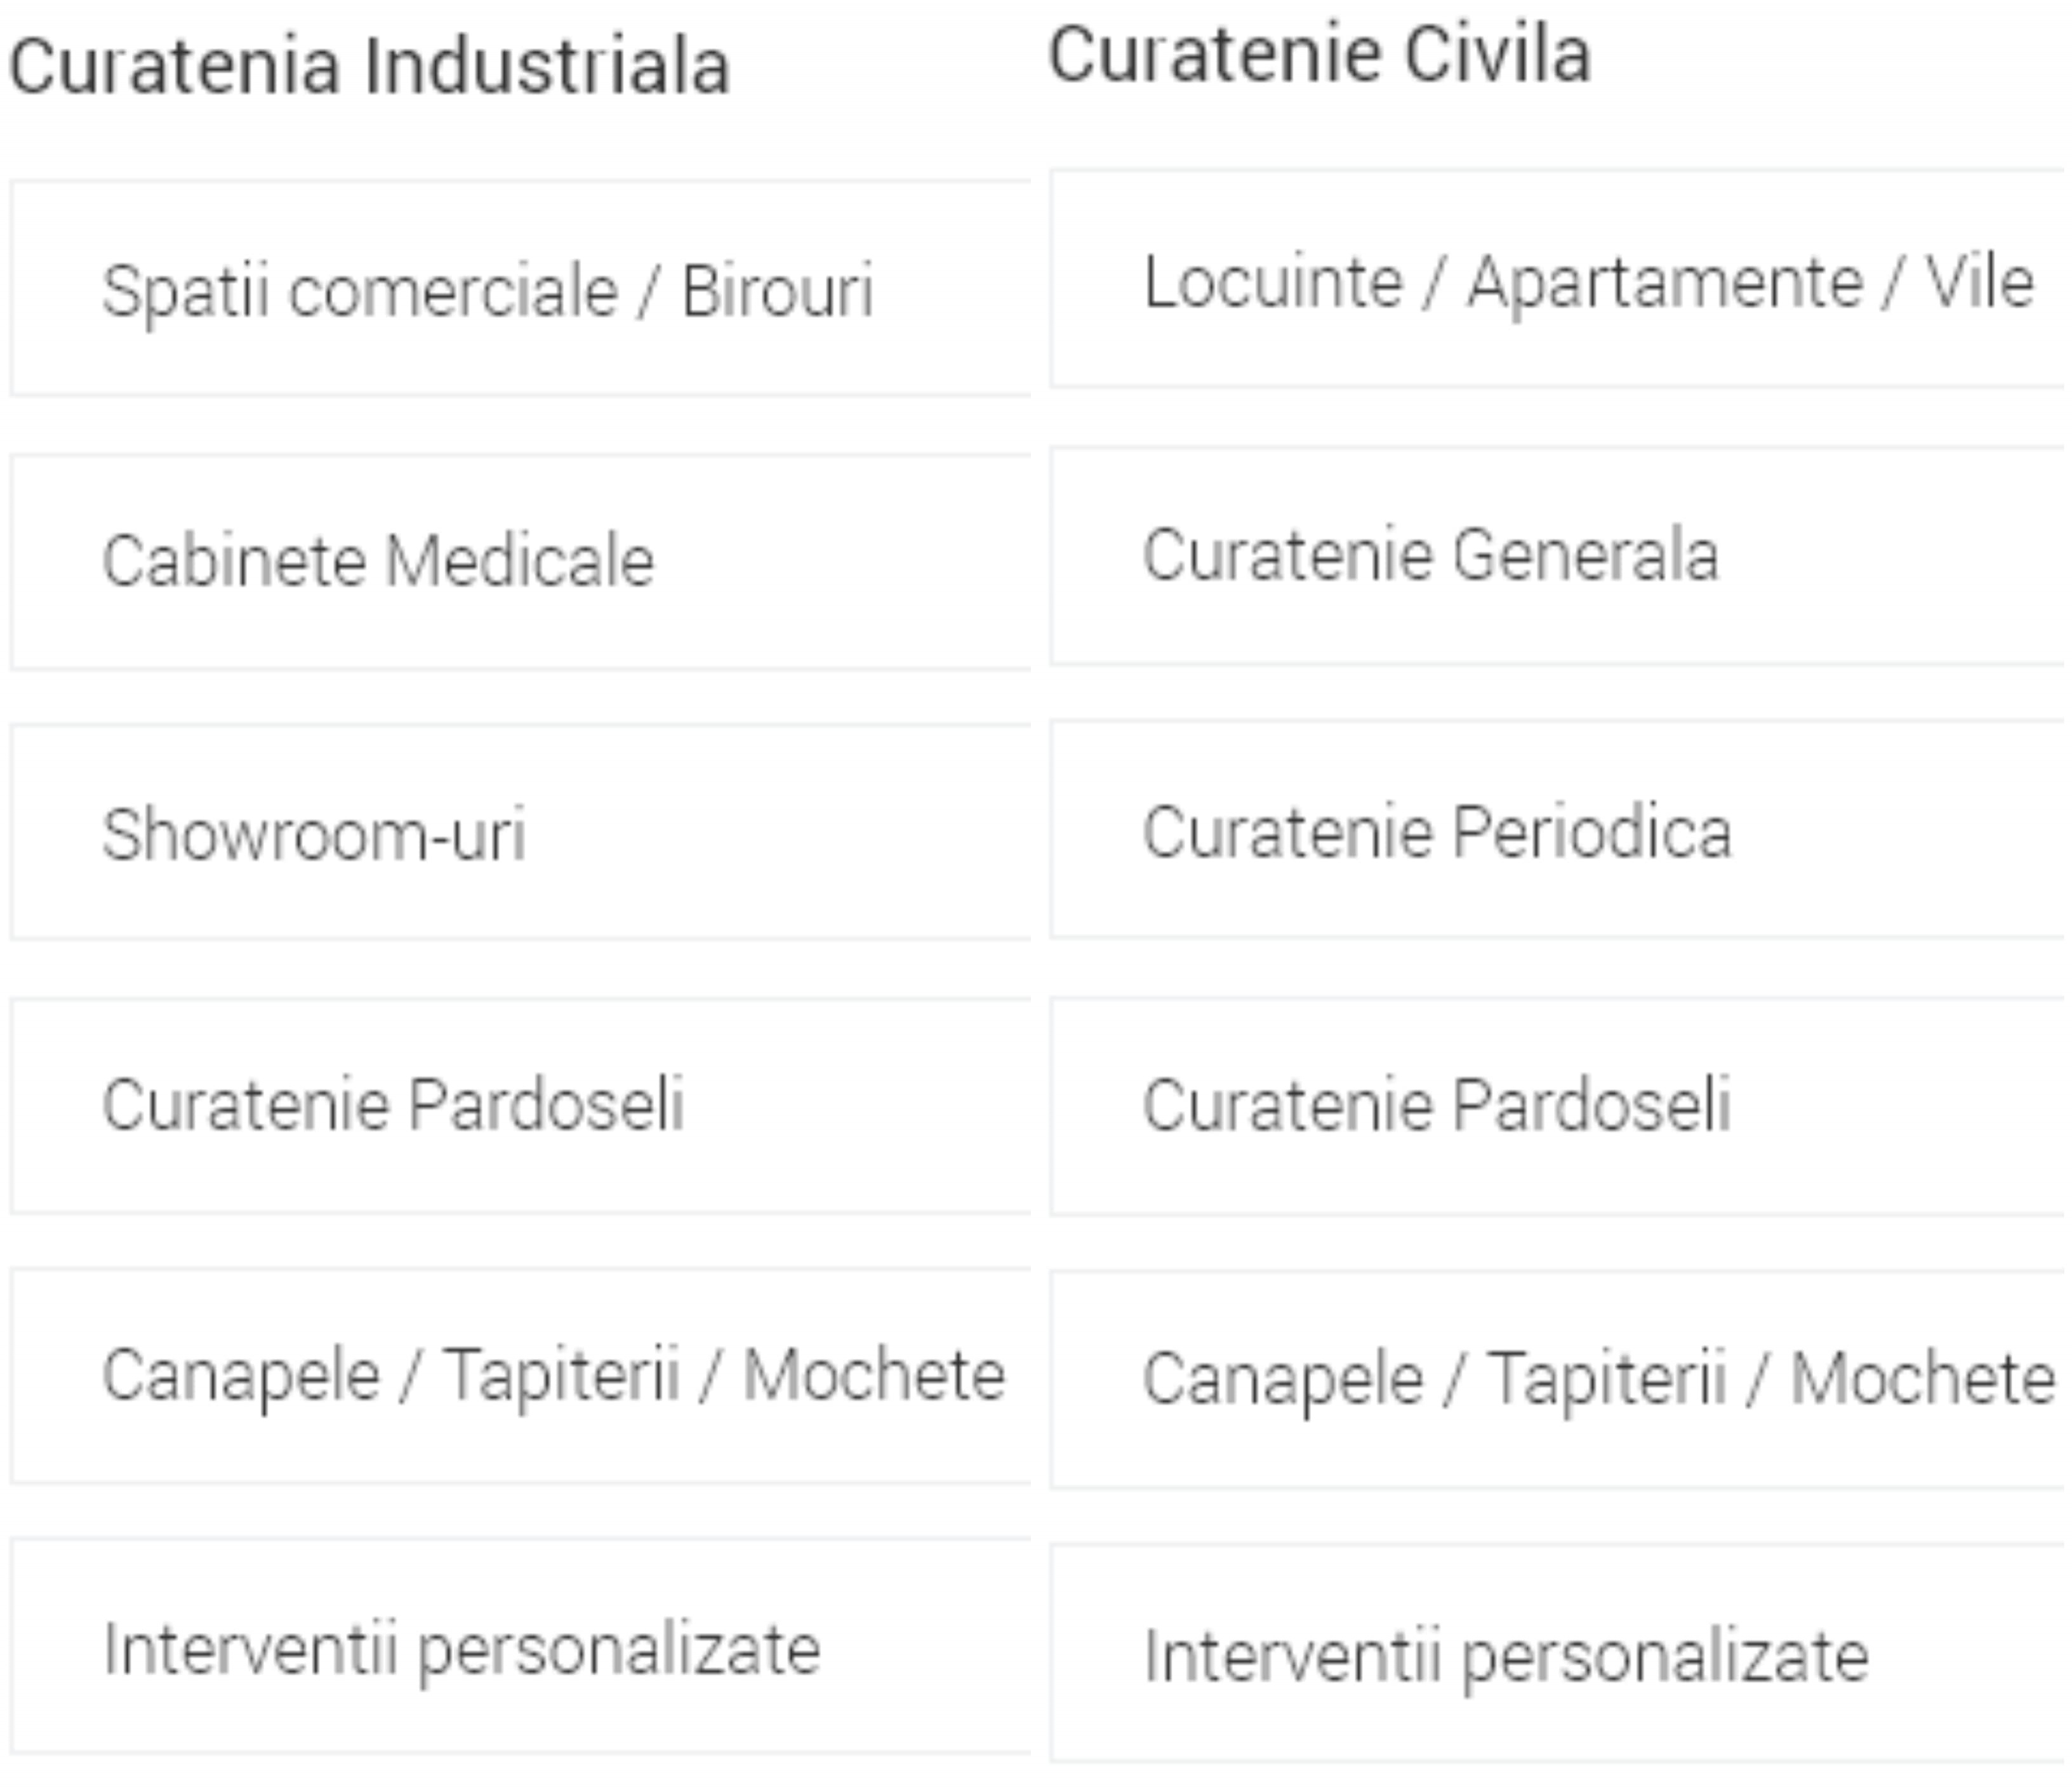 curatenie_civila_industriala_3264_01